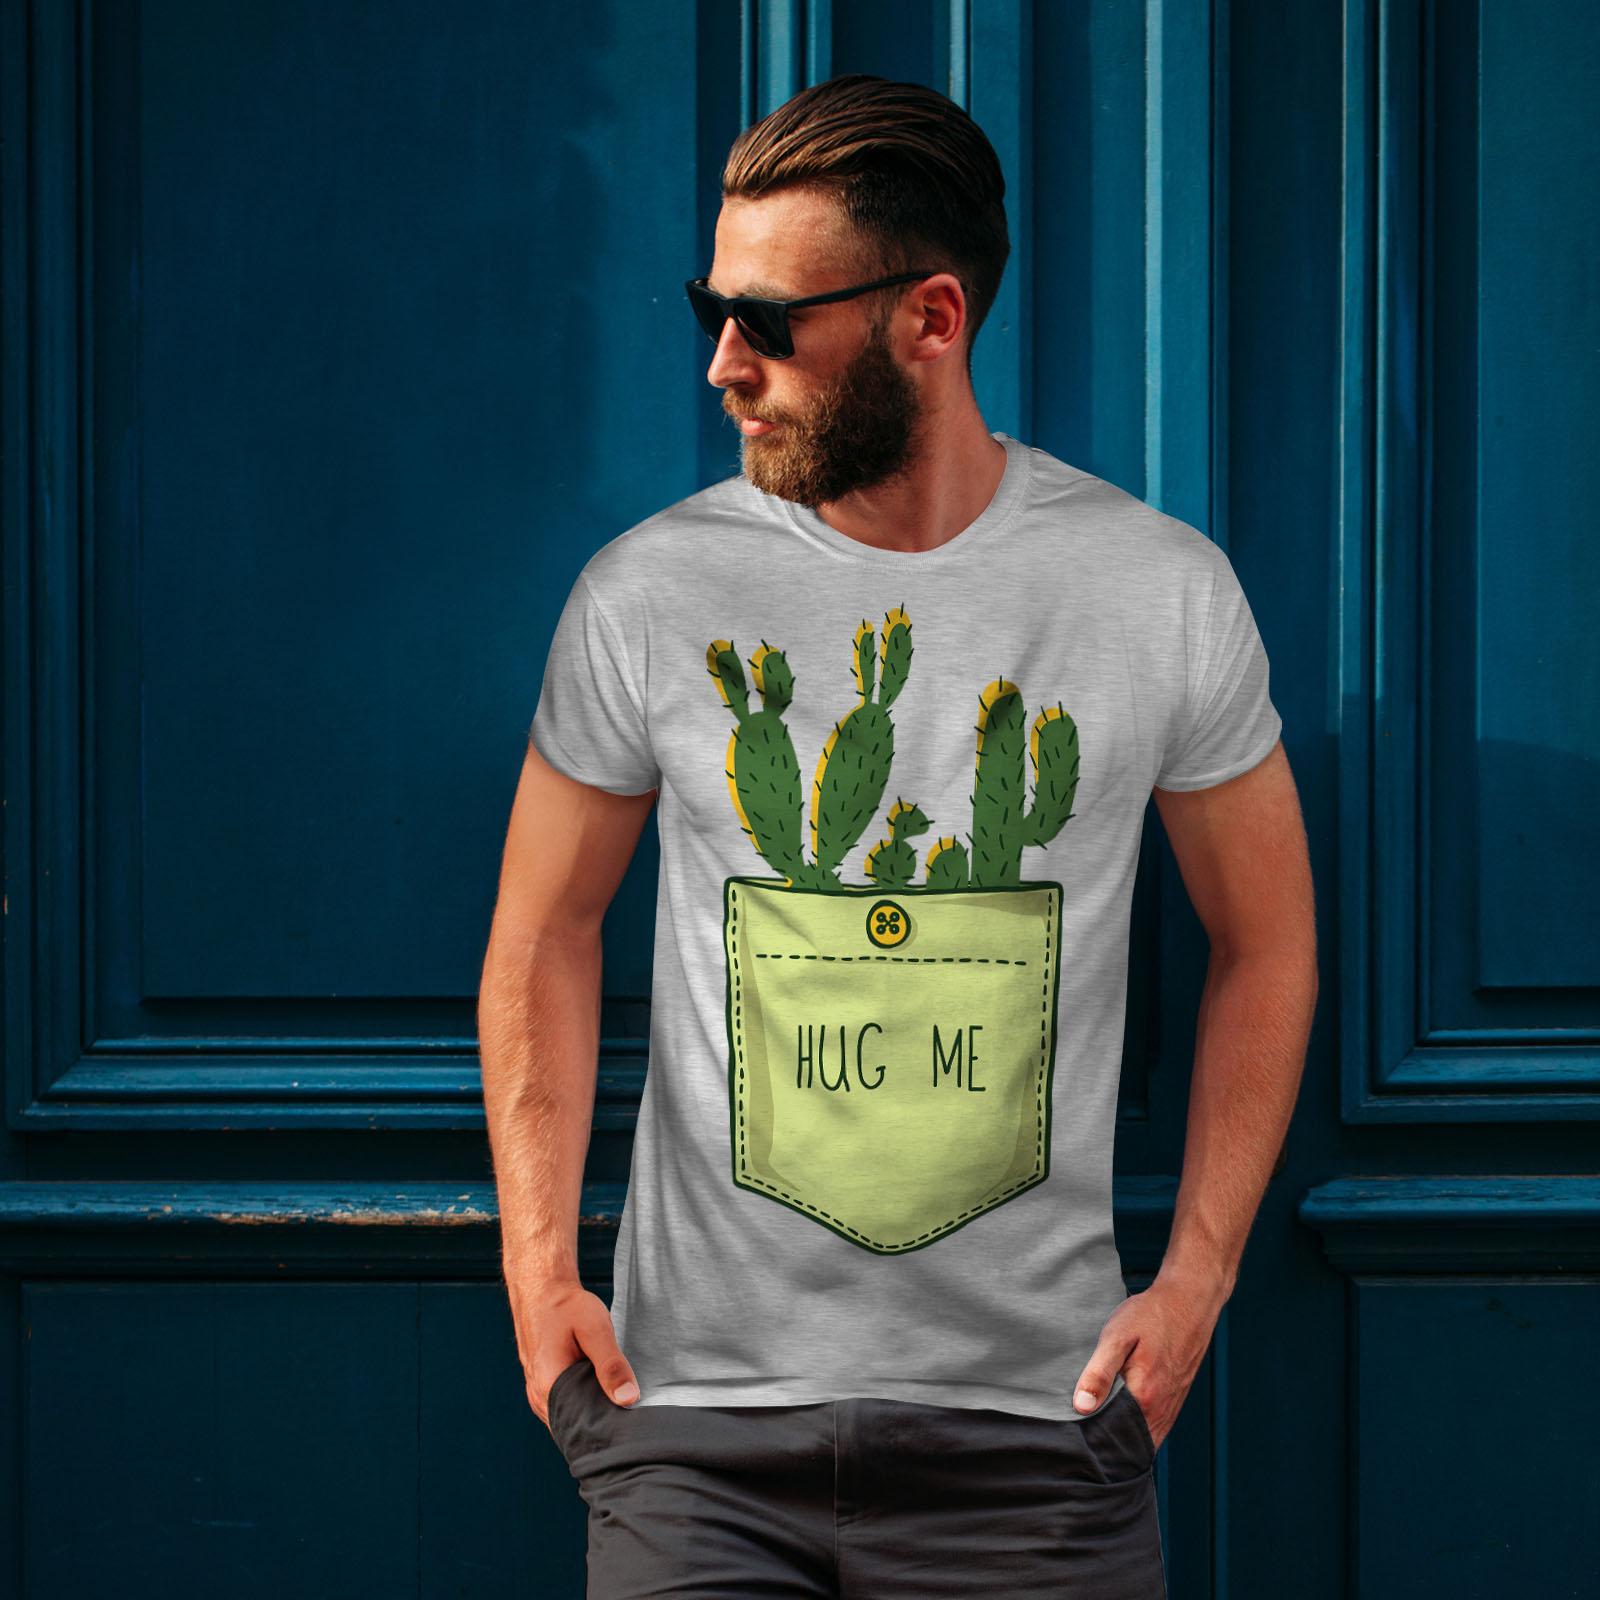 miniature 16 - Wellcoda Hug Me Cactus Funny Mens T-shirt,  Graphic Design Printed Tee